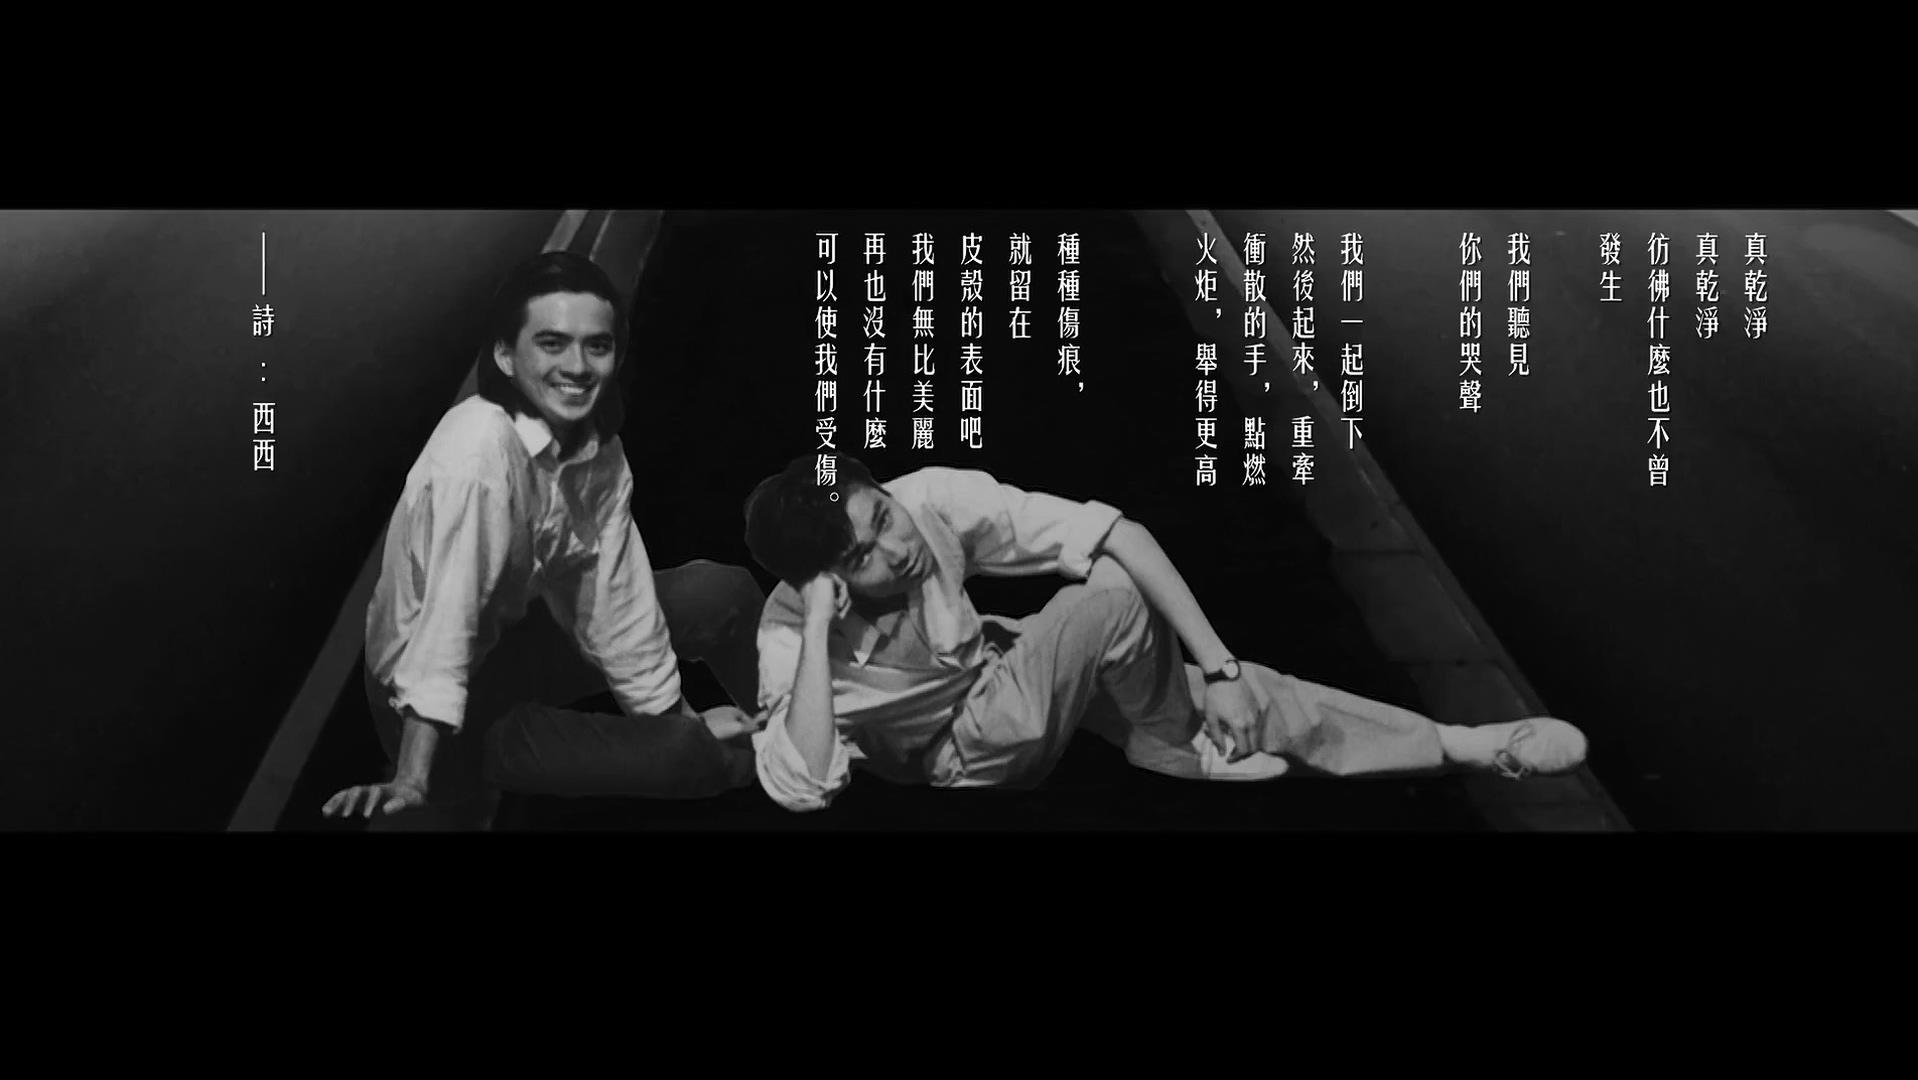 [达明卅一派对演唱会]Tat.Ming.Pair.30th.Anniversary.Live.Concert.2017.BluRay.1080p.x264.AAC-iSCG.mp4_20200701_223839.764